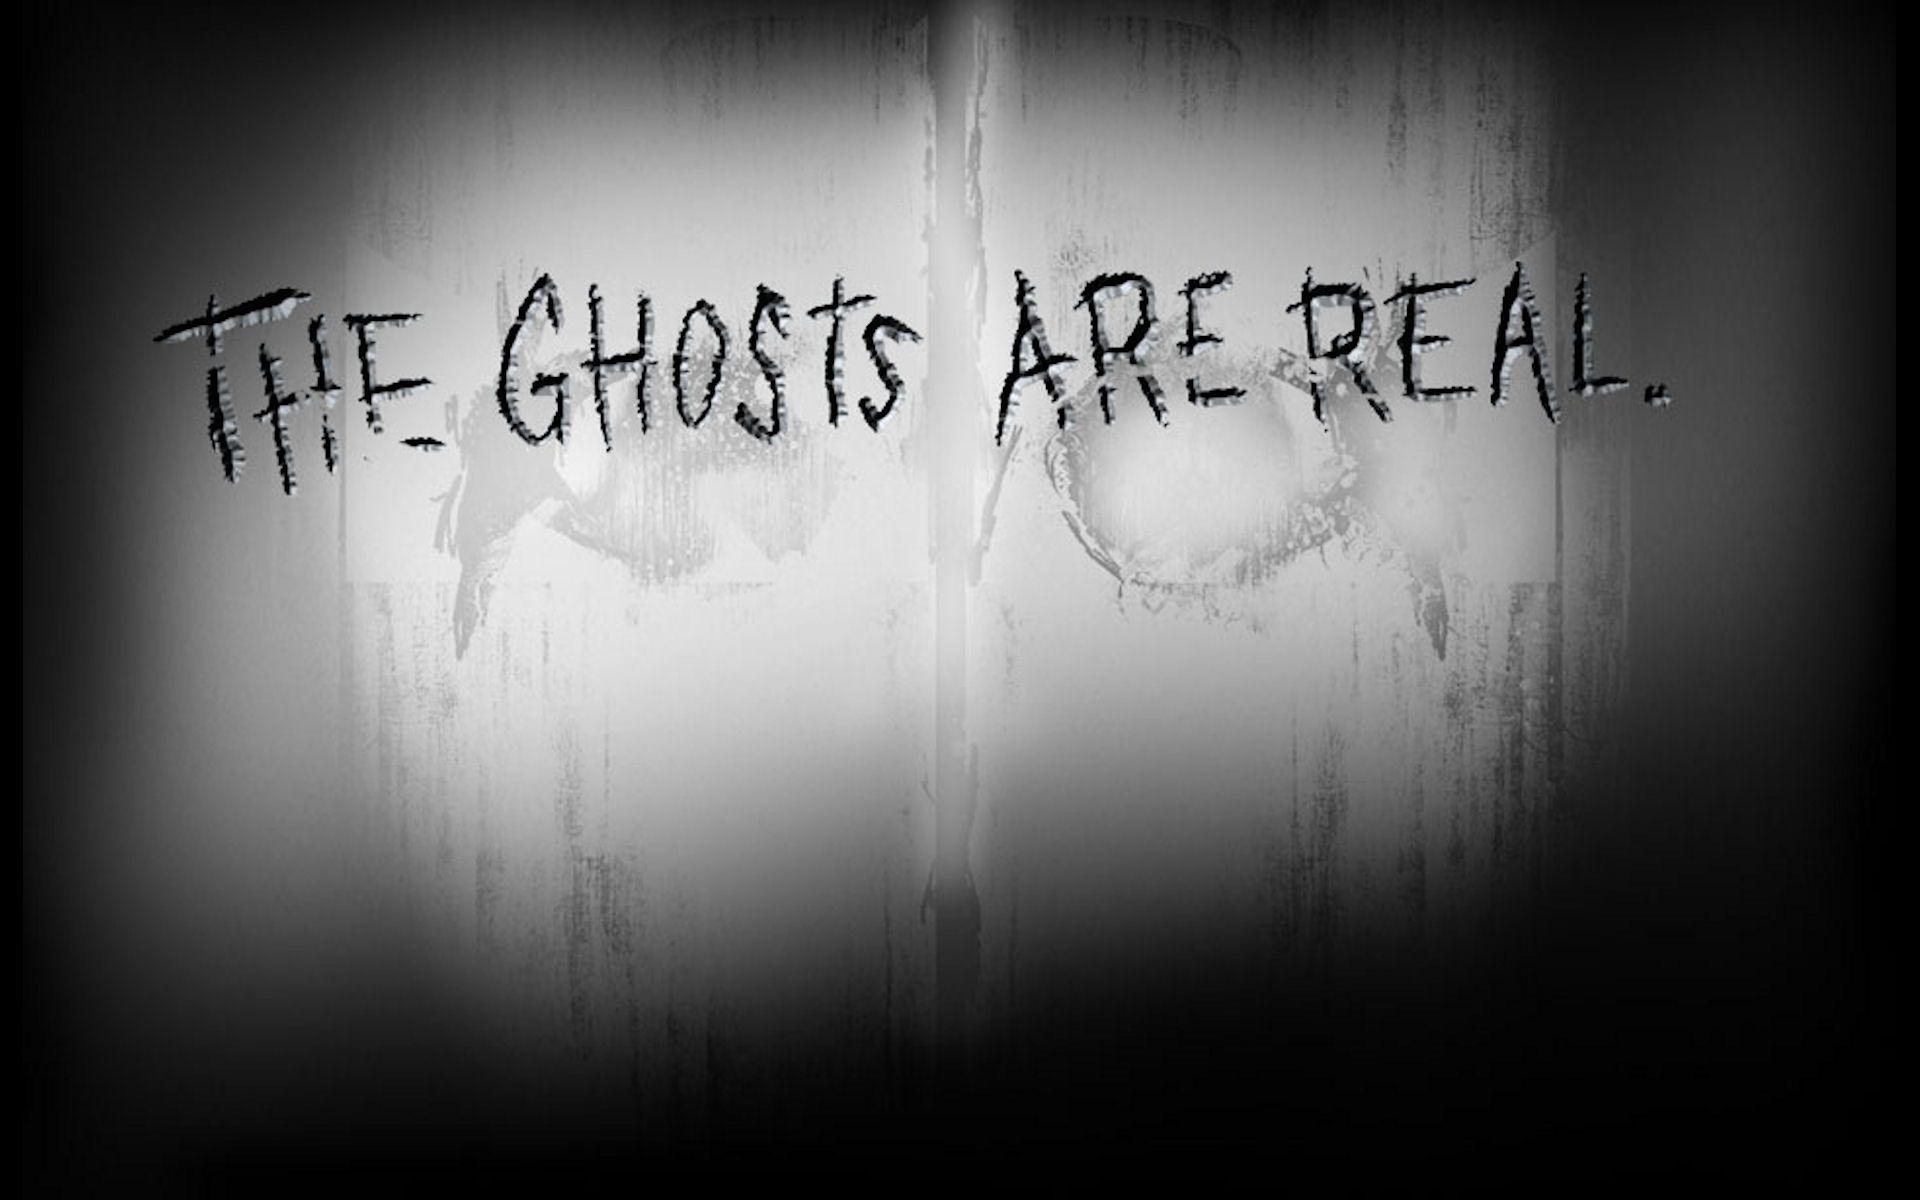 Must see Wallpaper Halloween Facebook - f41b6a9bd0b3bb2161020ab09f6e0e09  Photograph_218268.jpg